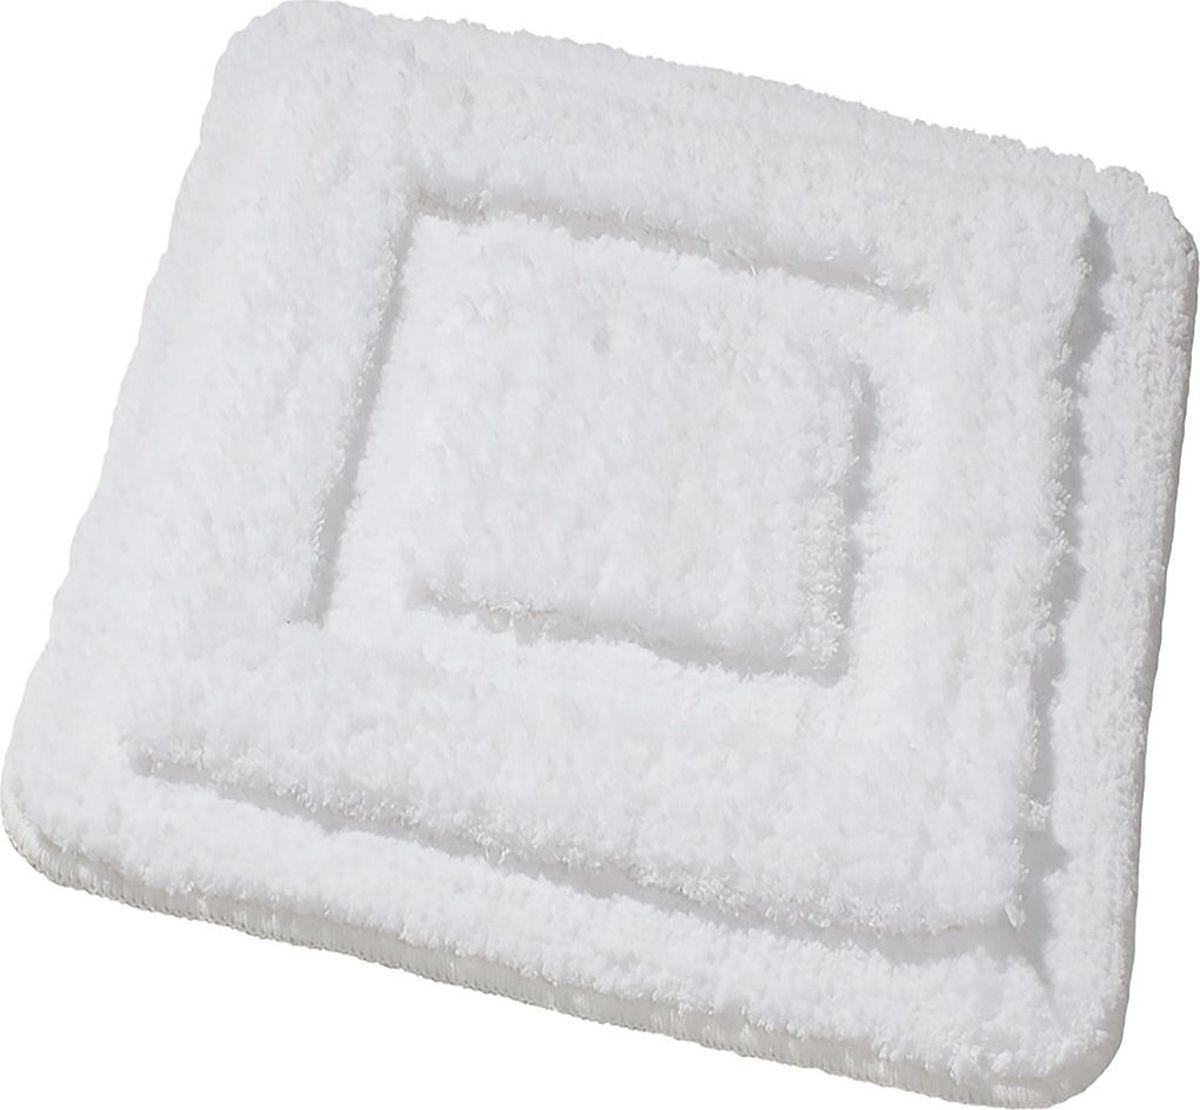 Коврик для ванной Ridder Juwel, цвет: белый, 55 х 50 см коврик для ванной ridder grand prix цвет белый синий 55 х 85 см